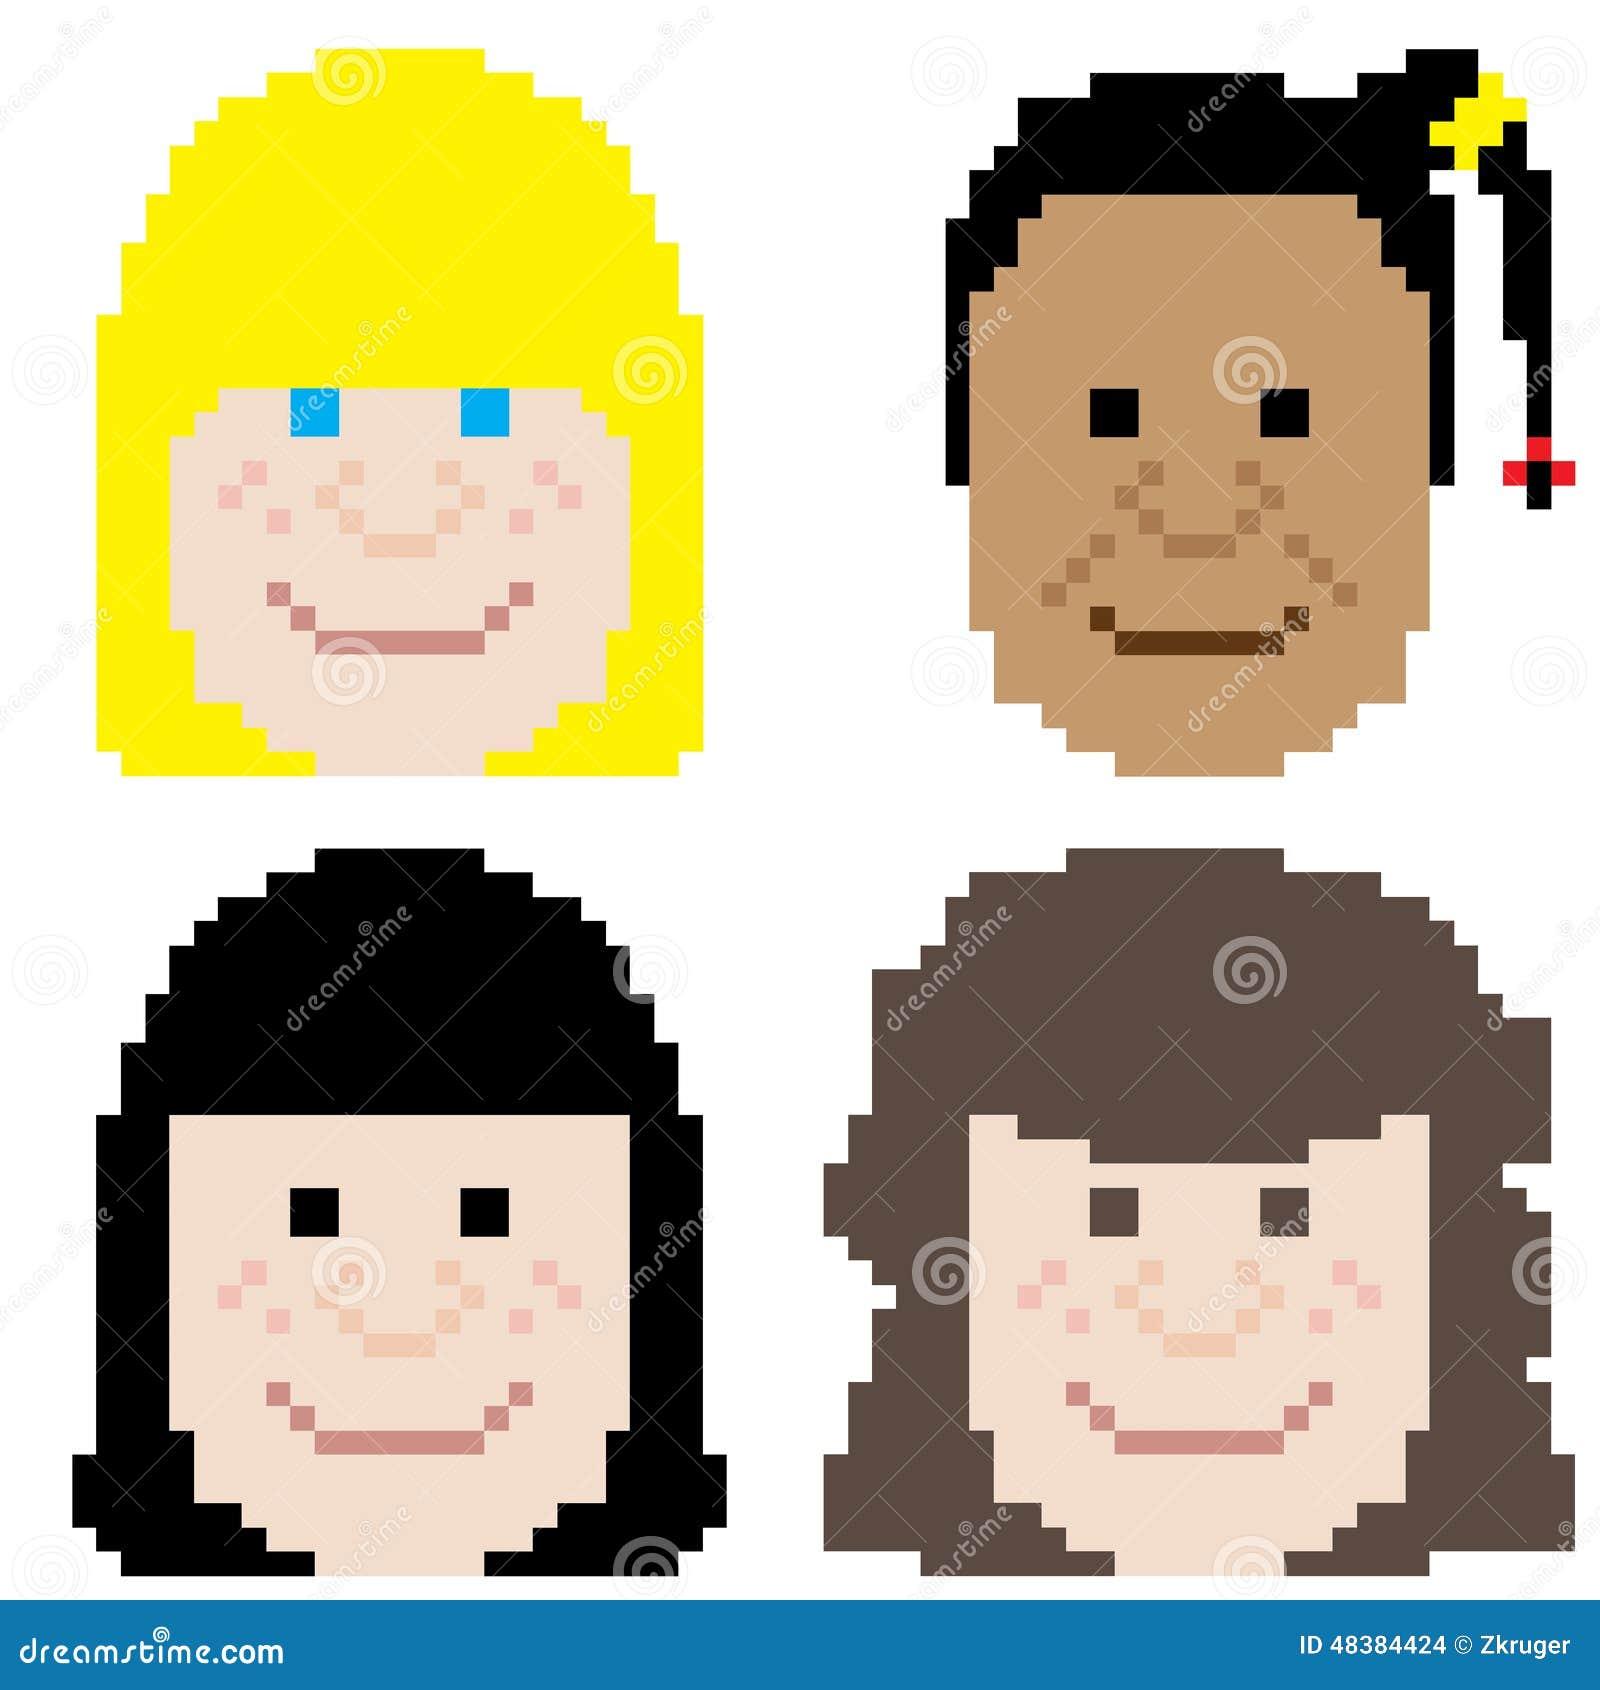 Girl Face Pixel Art Stock Vector. Illustration Of Faces